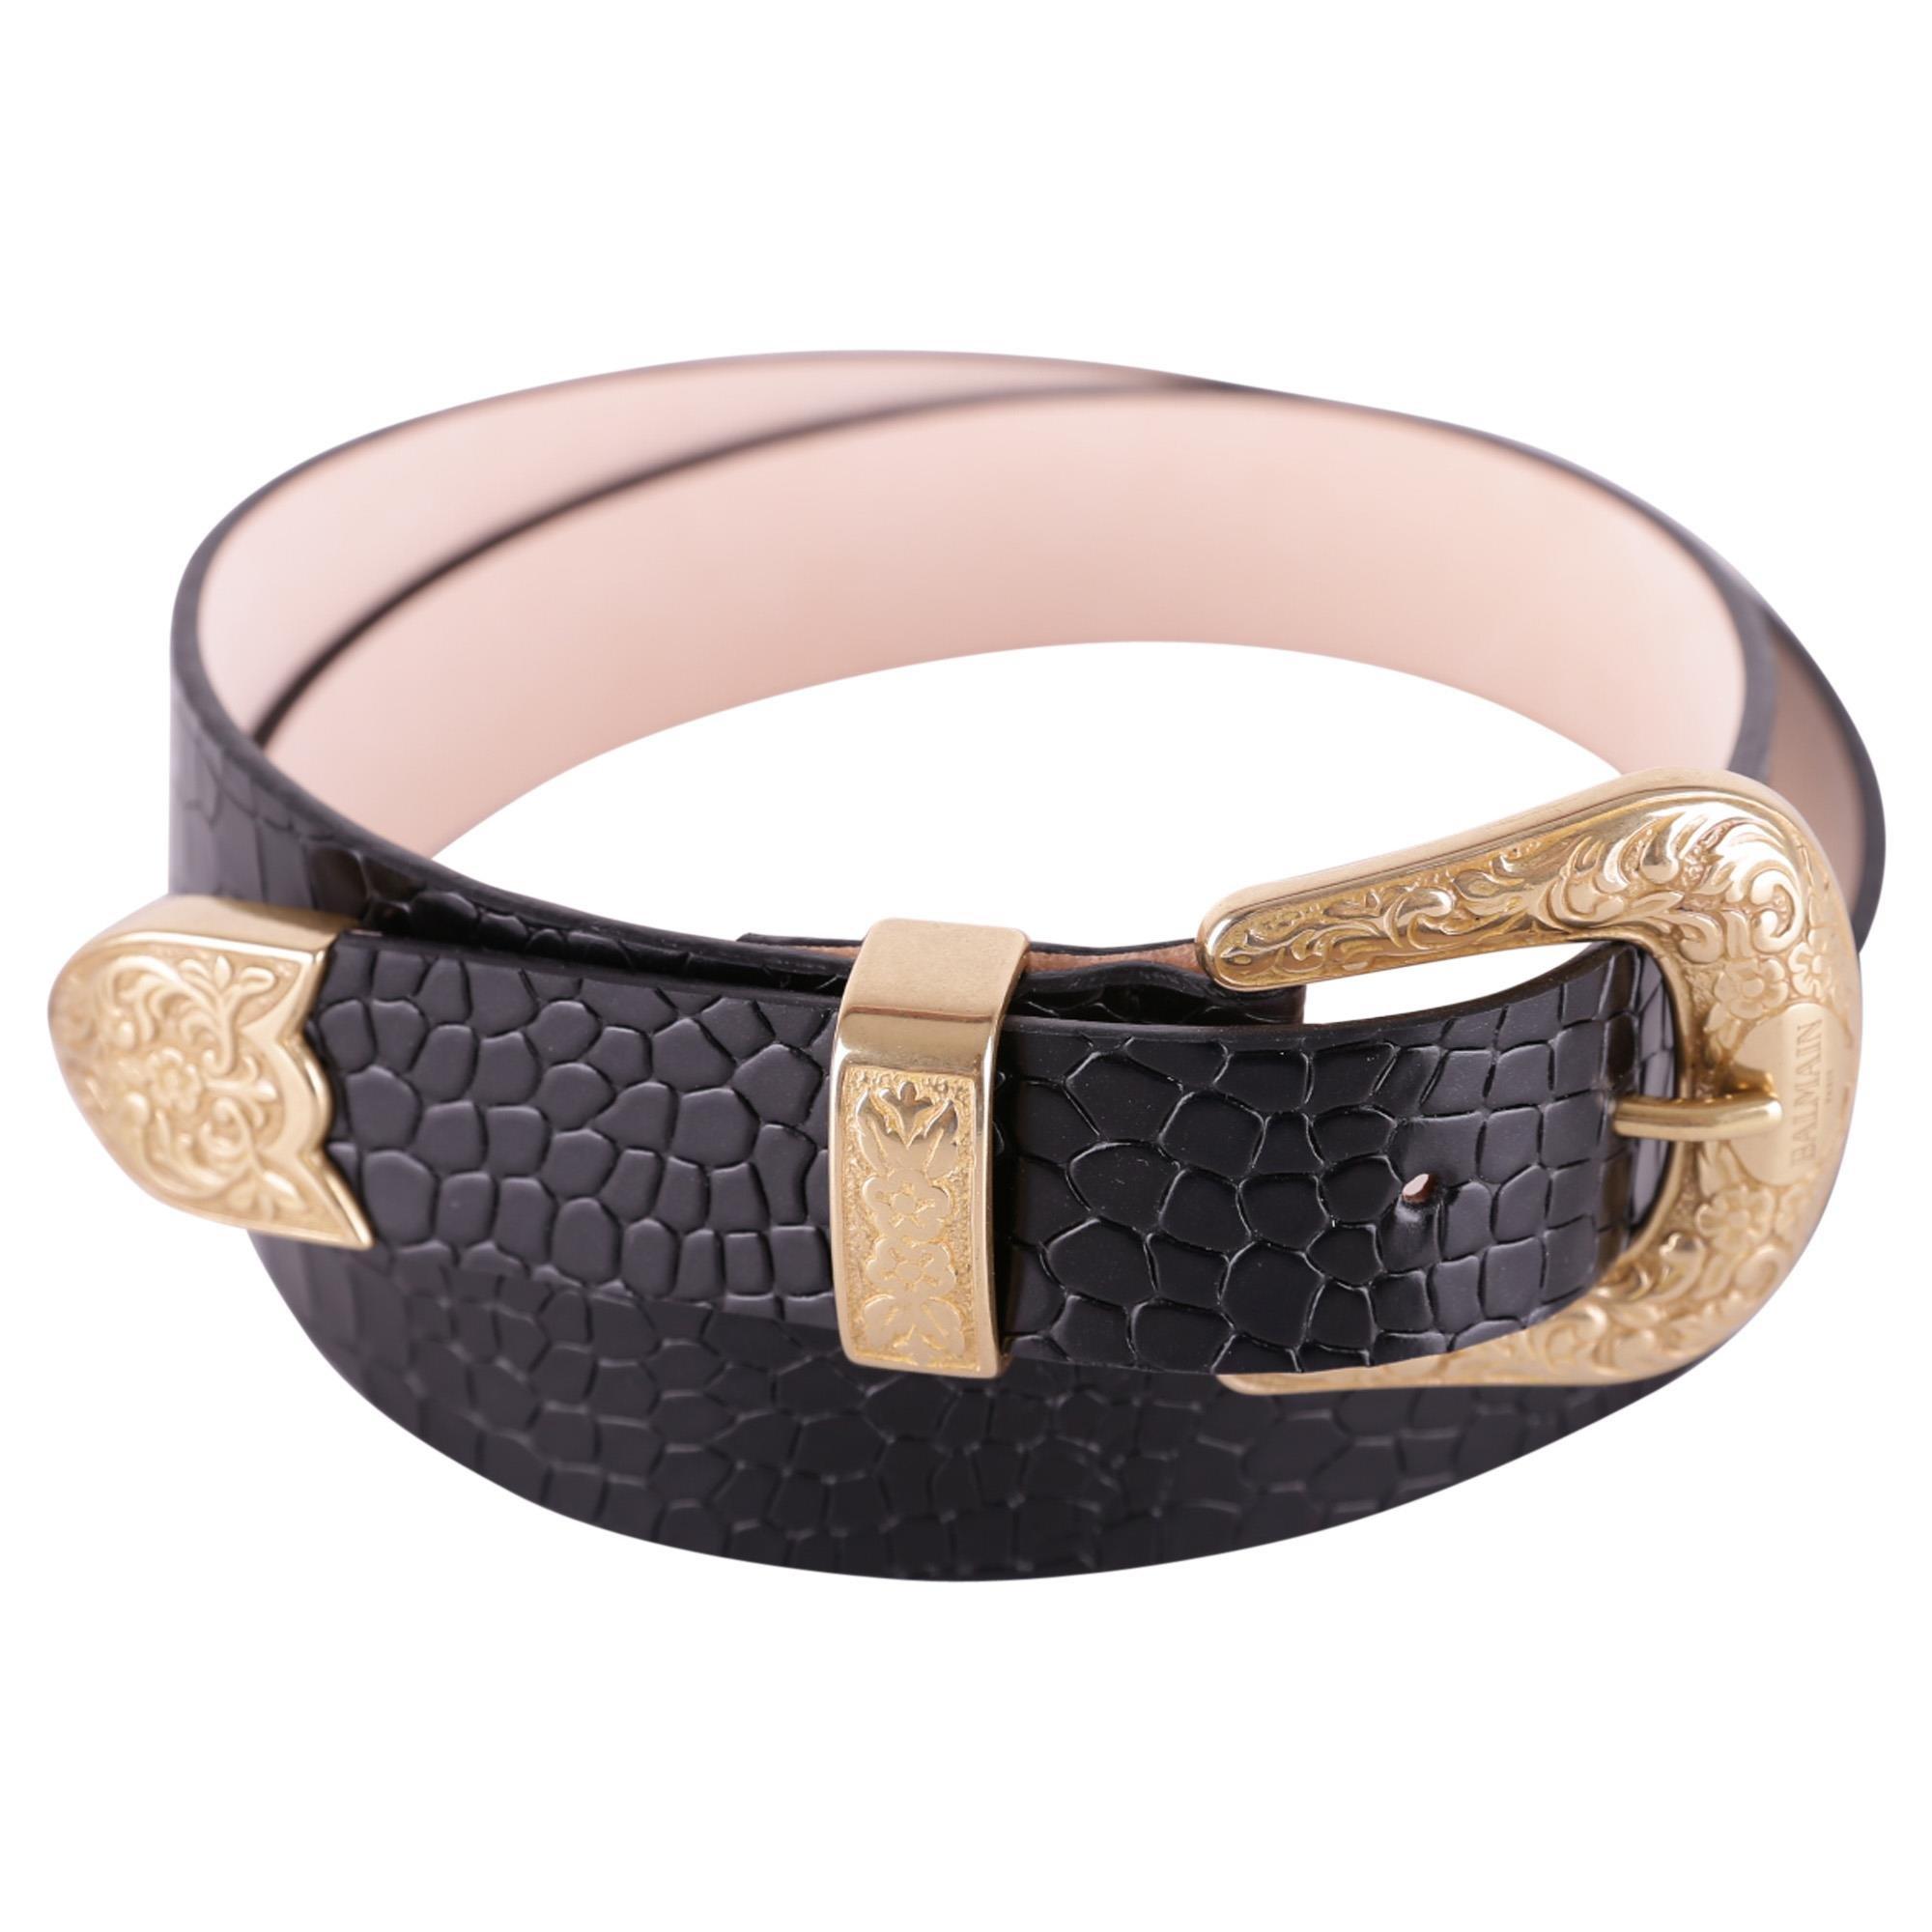 Balmain Women's 129786386Pc0100 Black Leather Belt